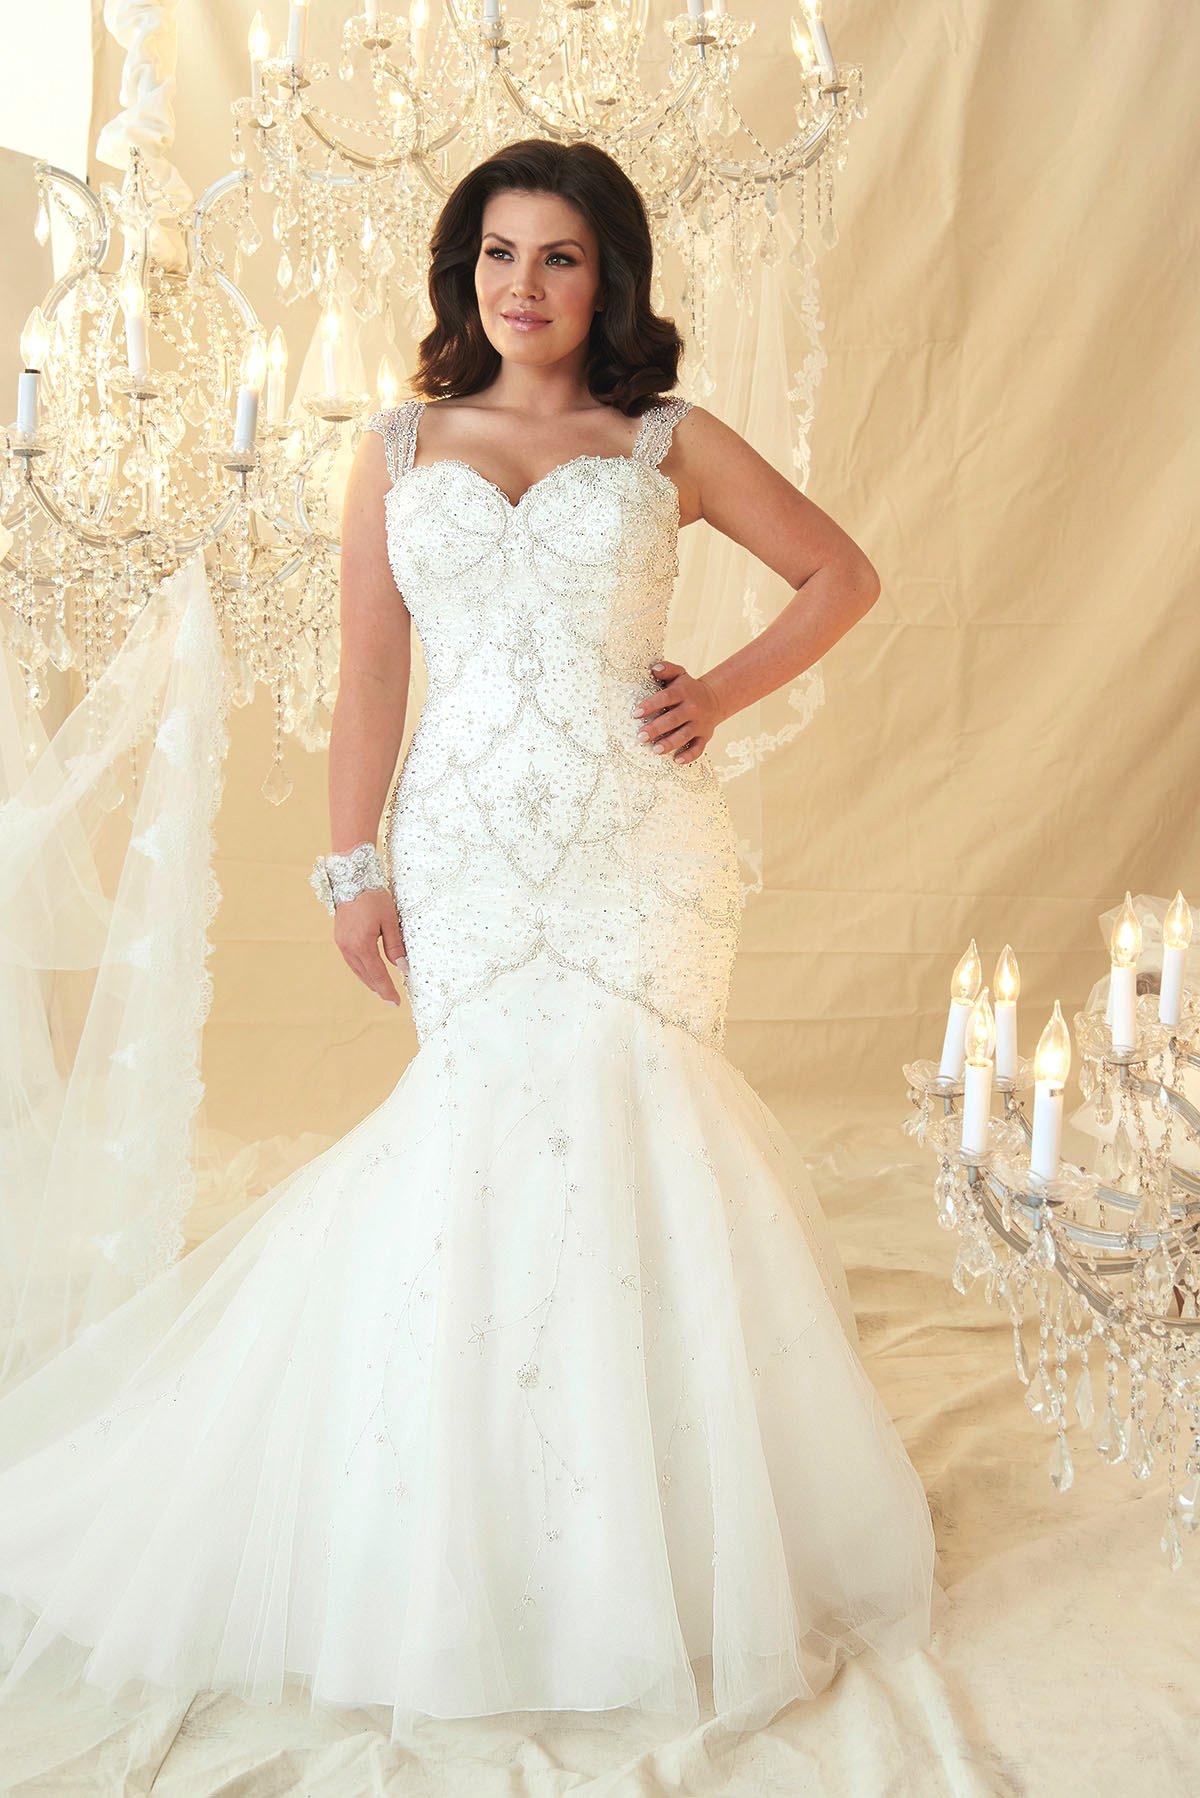 Win a callista wedding dress worth 1 800 love our wedding for Win free wedding dress